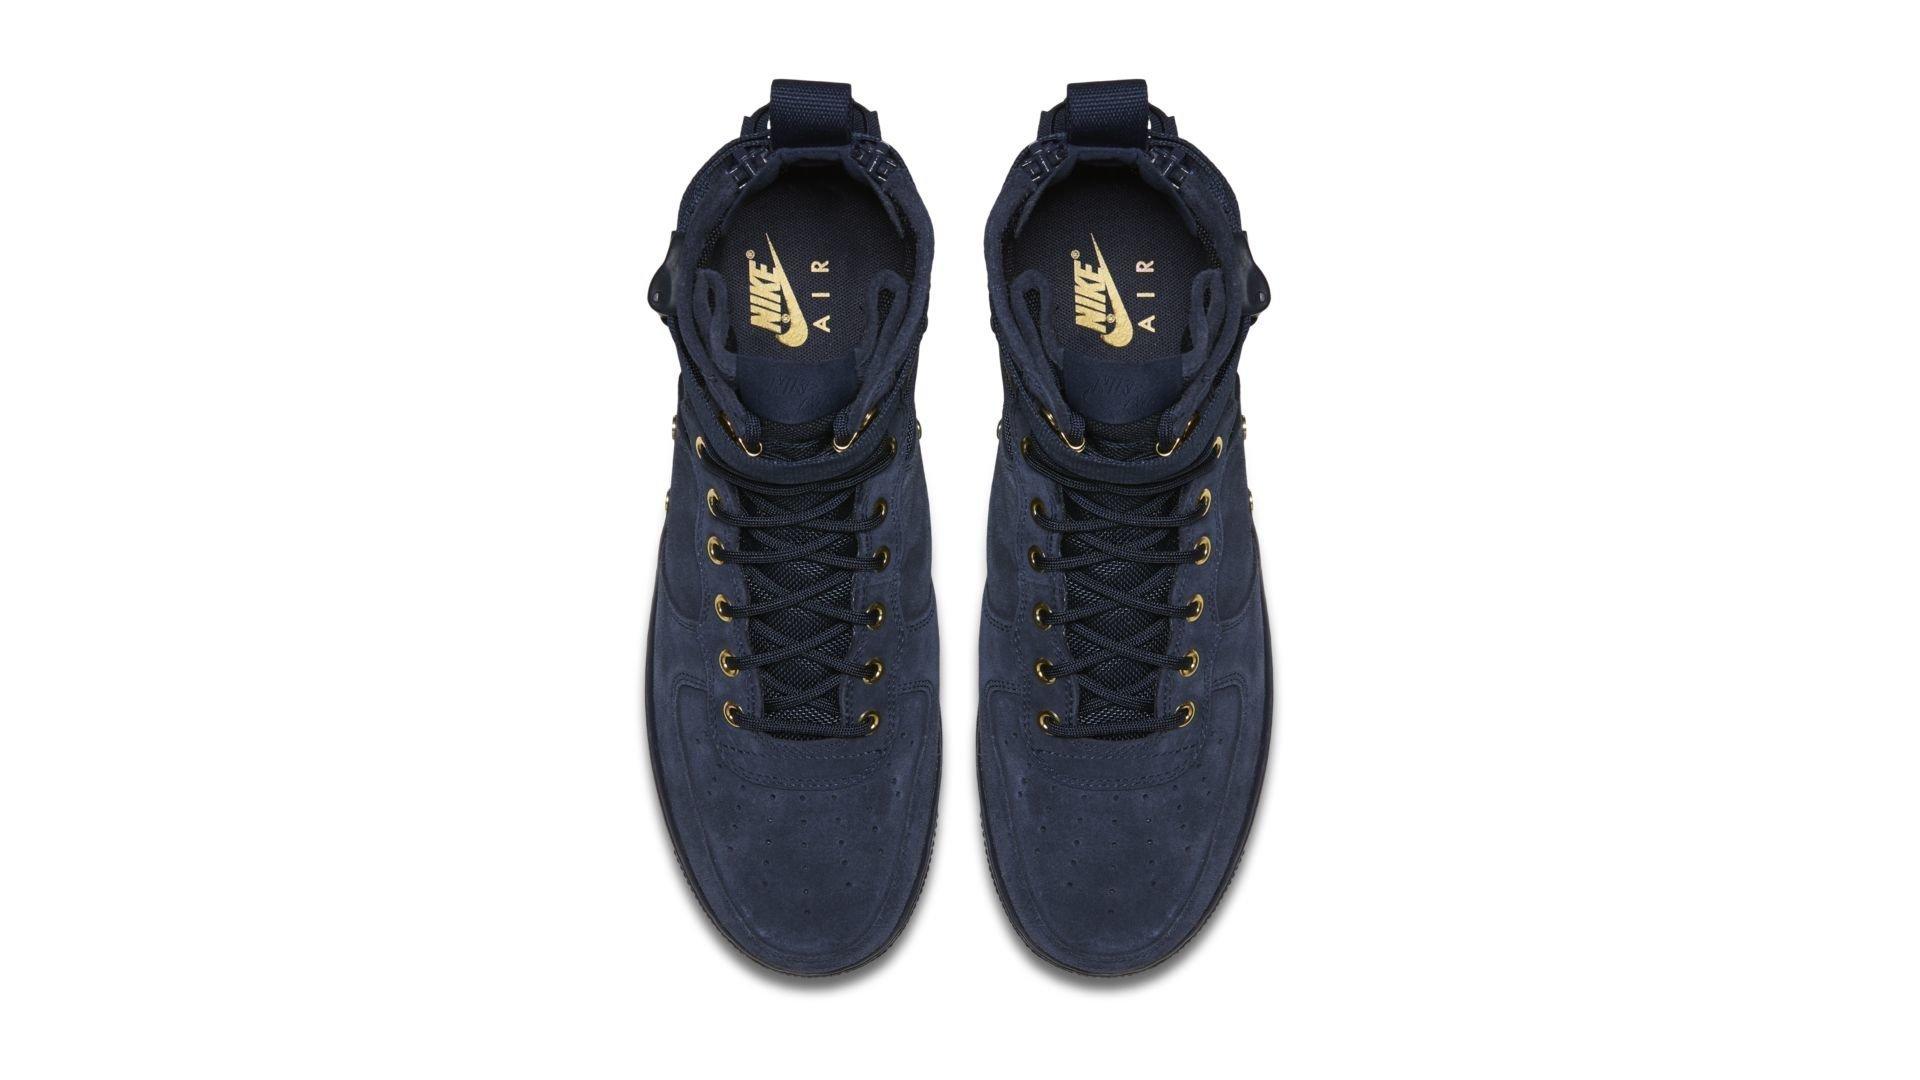 Nike SF Air Force 1 Mid Obsidian Metallic Gold (917753 400)